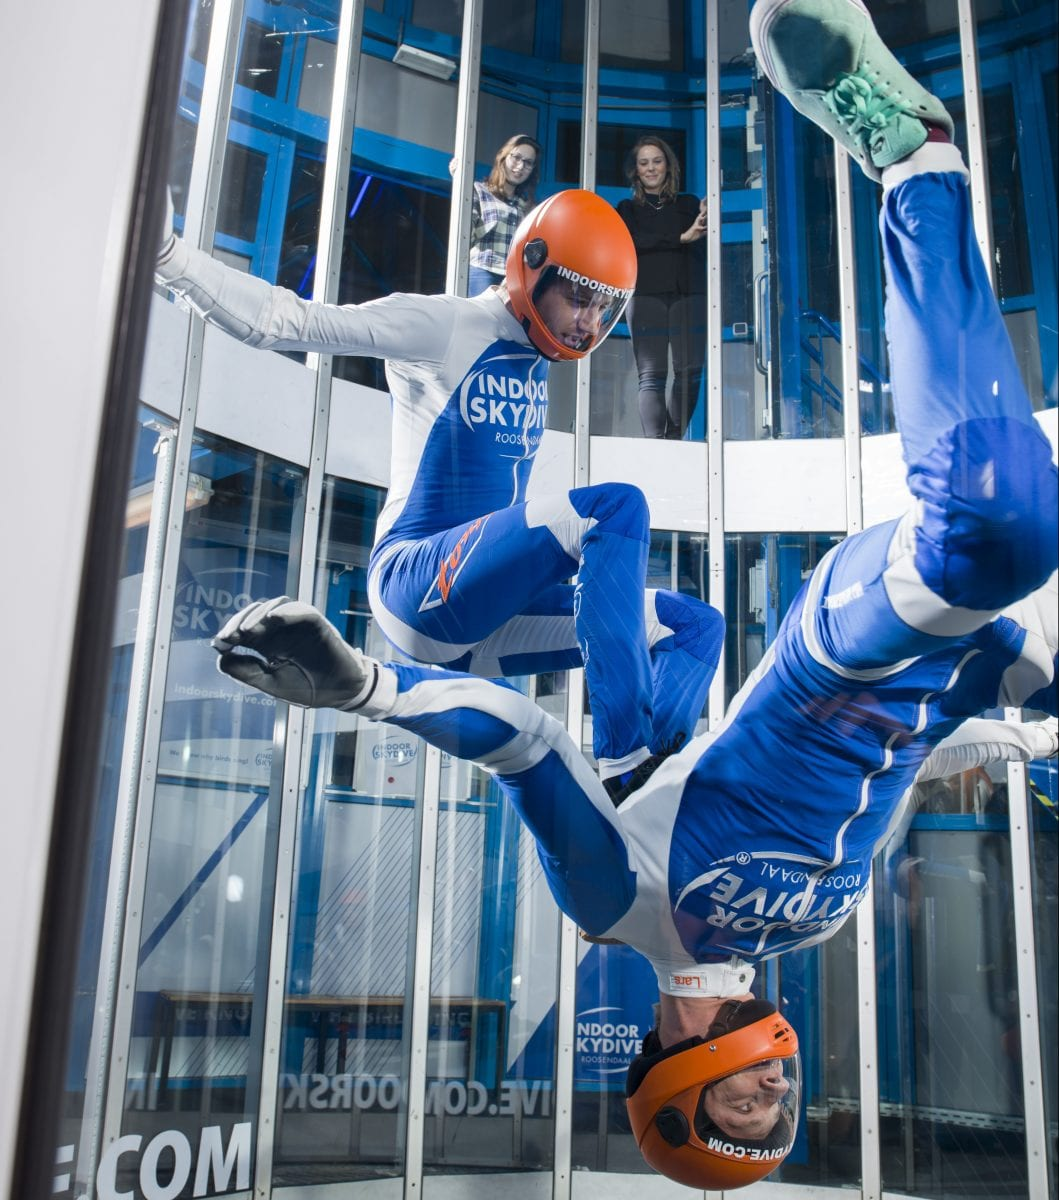 Indoor_Skydive_Roosendaal_pro's